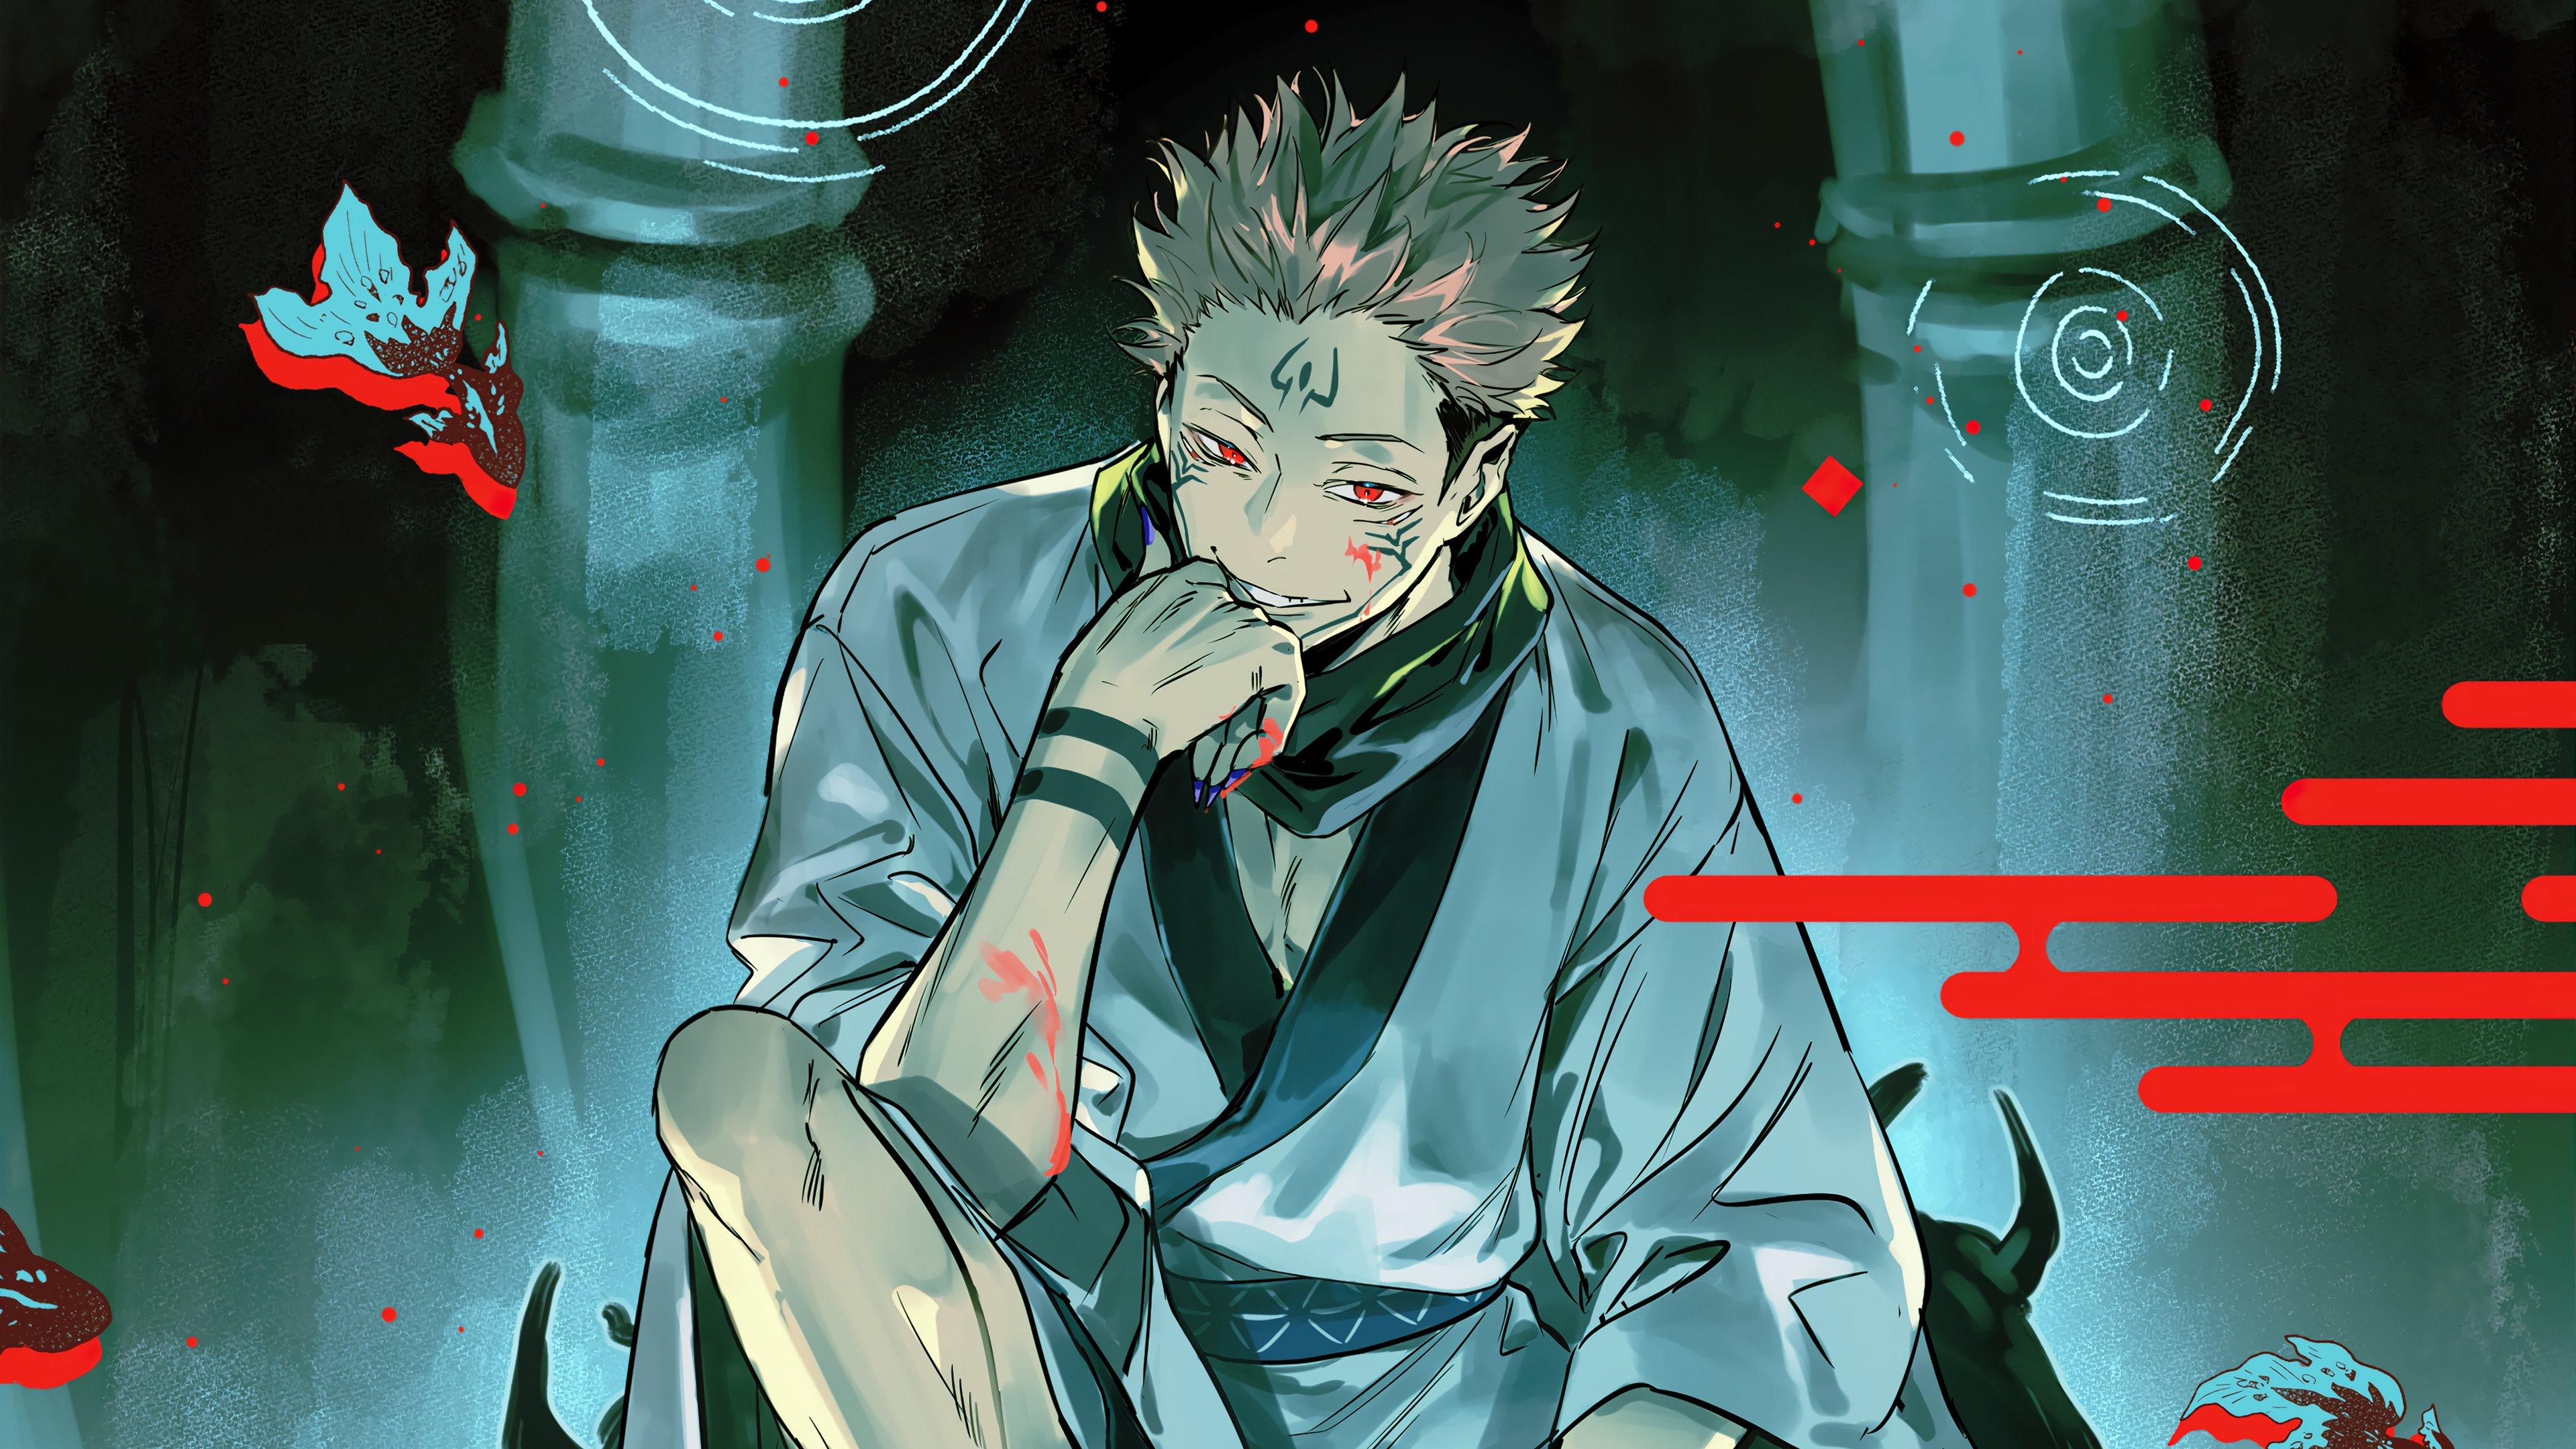 Fondos de pantalla Anime Sakuna de Jujutsu Kaisen